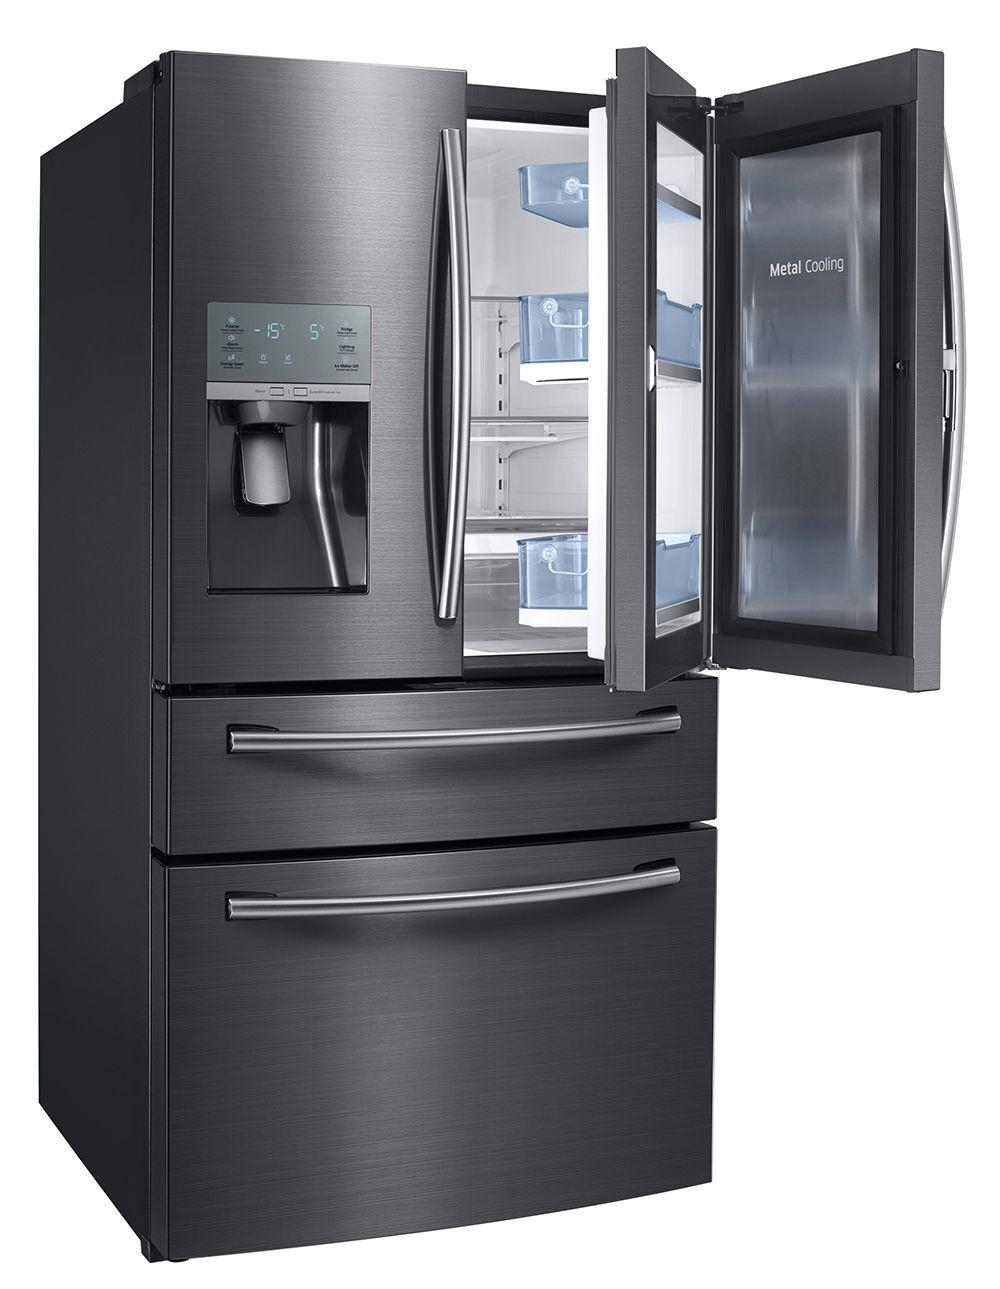 Samsung Appliance 36 Black Stainless Steel Series Energy Star